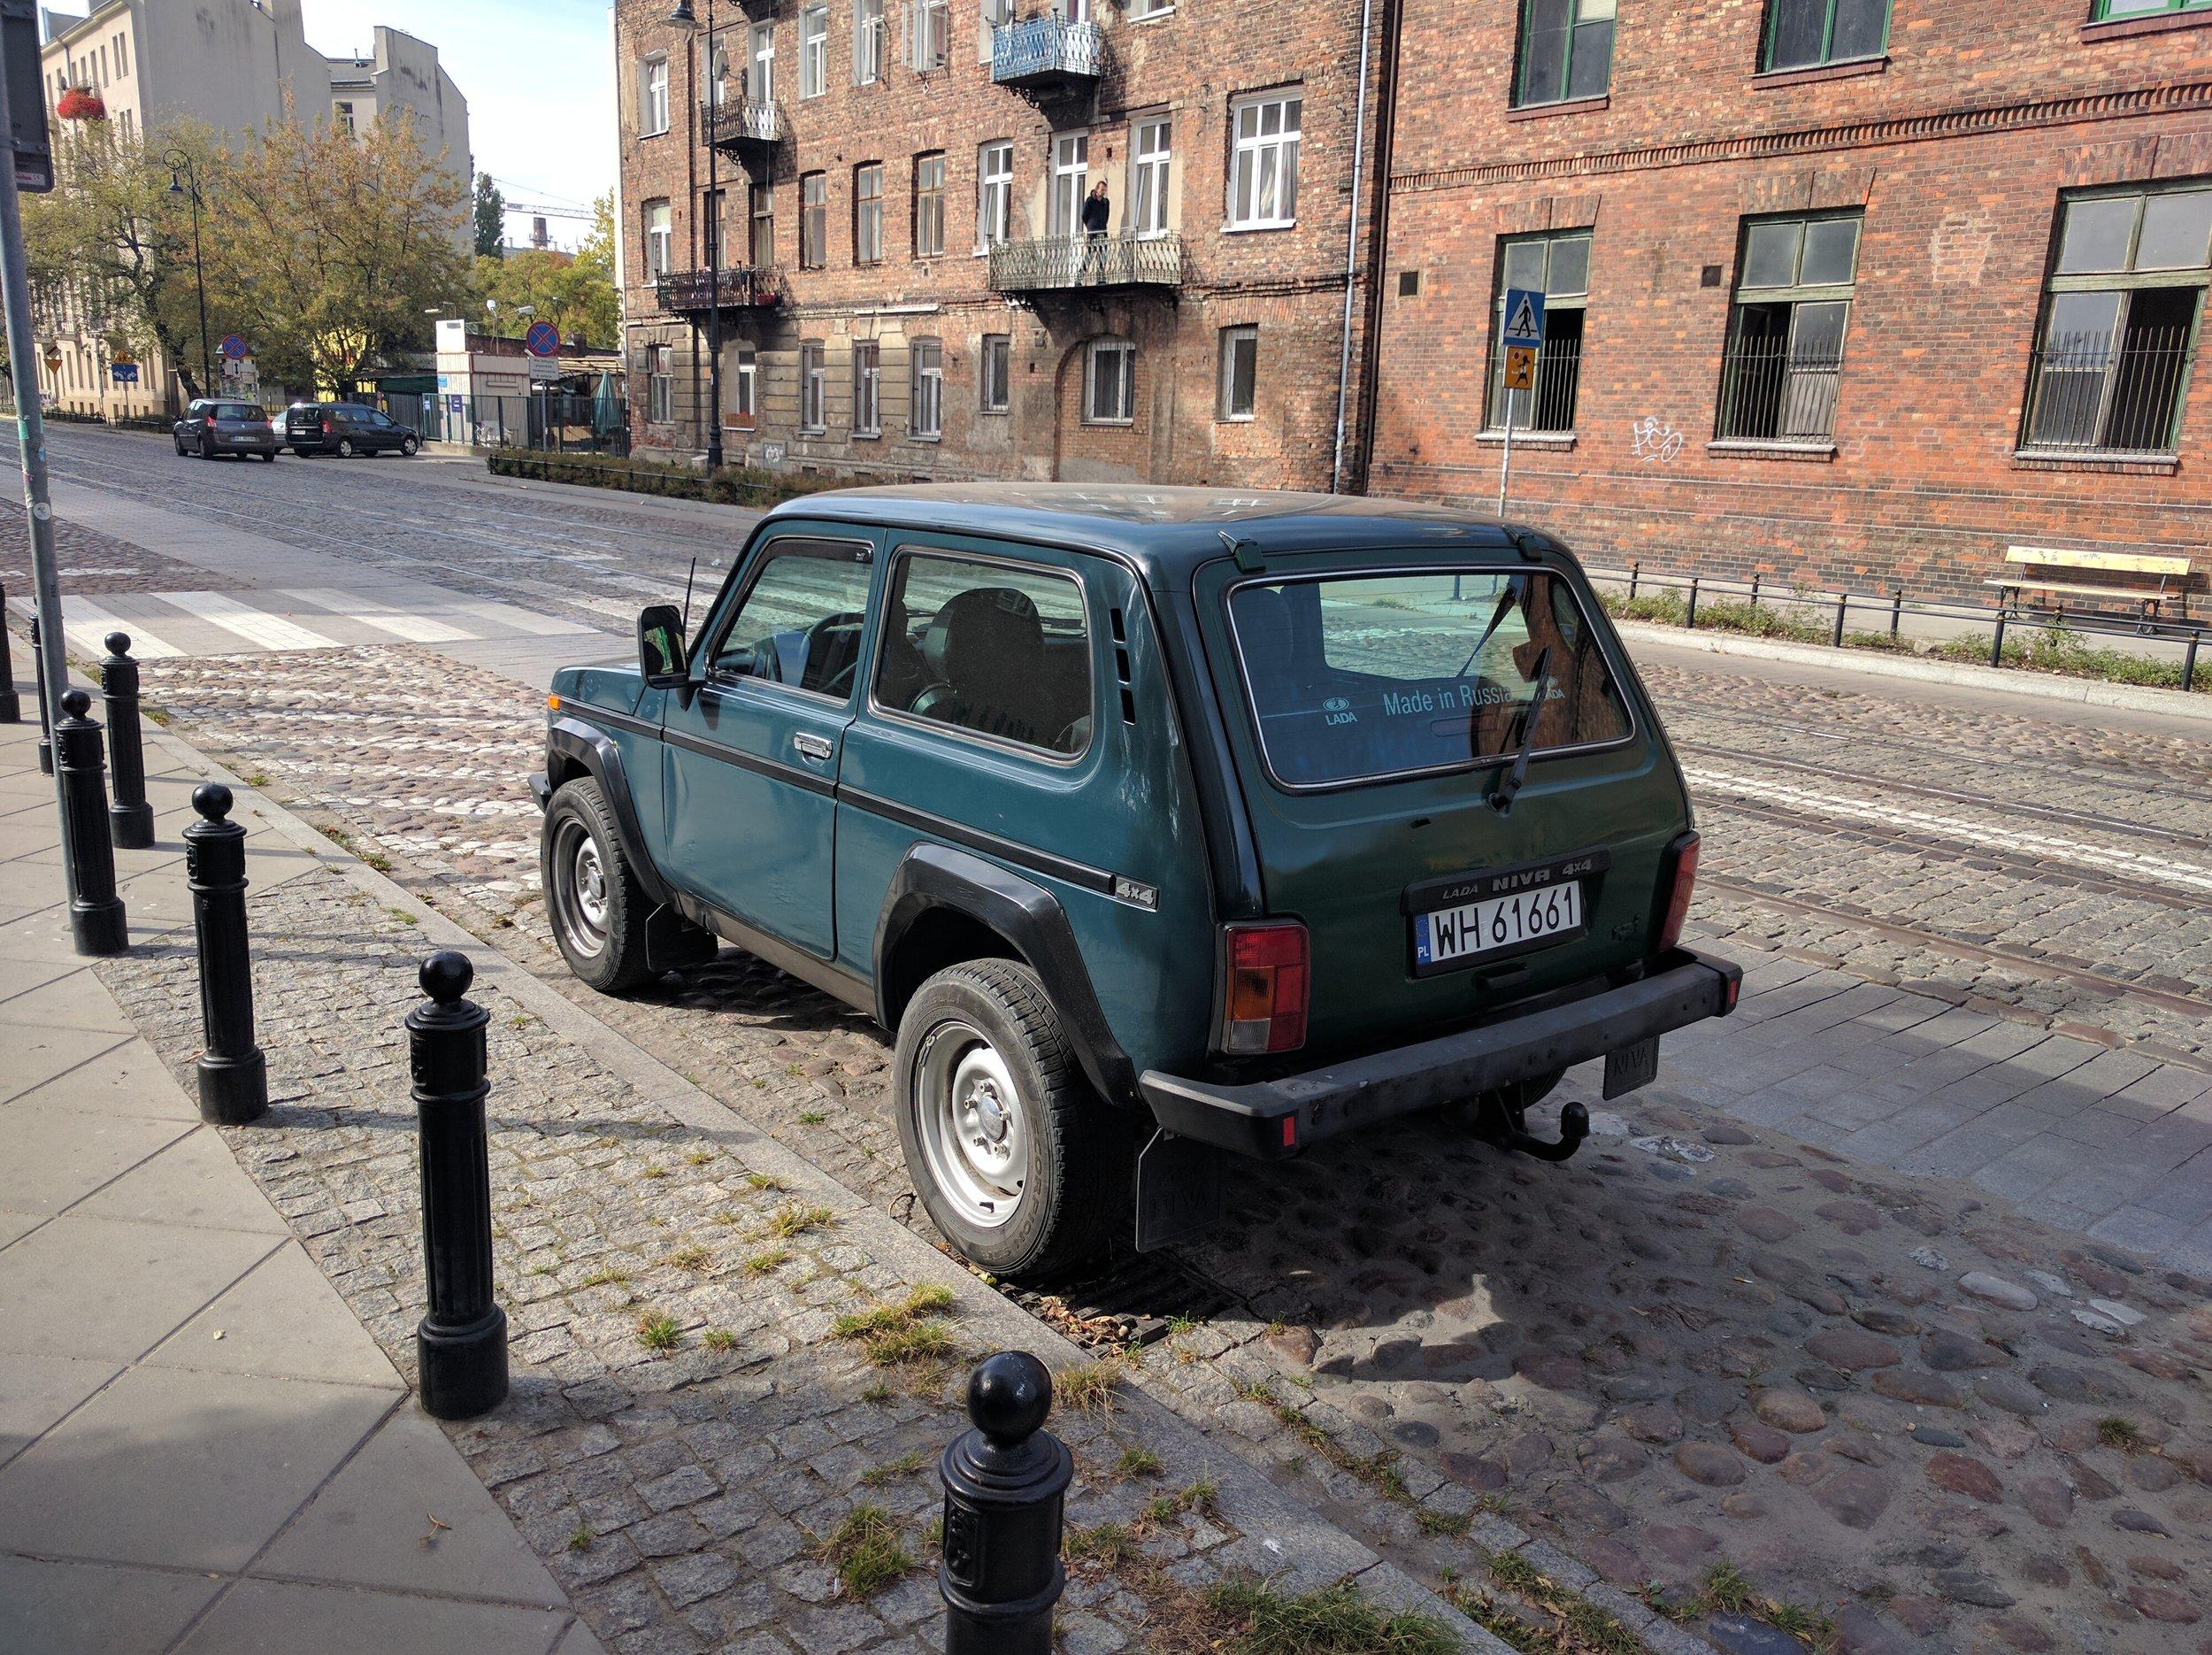 A 4x4 Lada in Warsaw's Praga district.